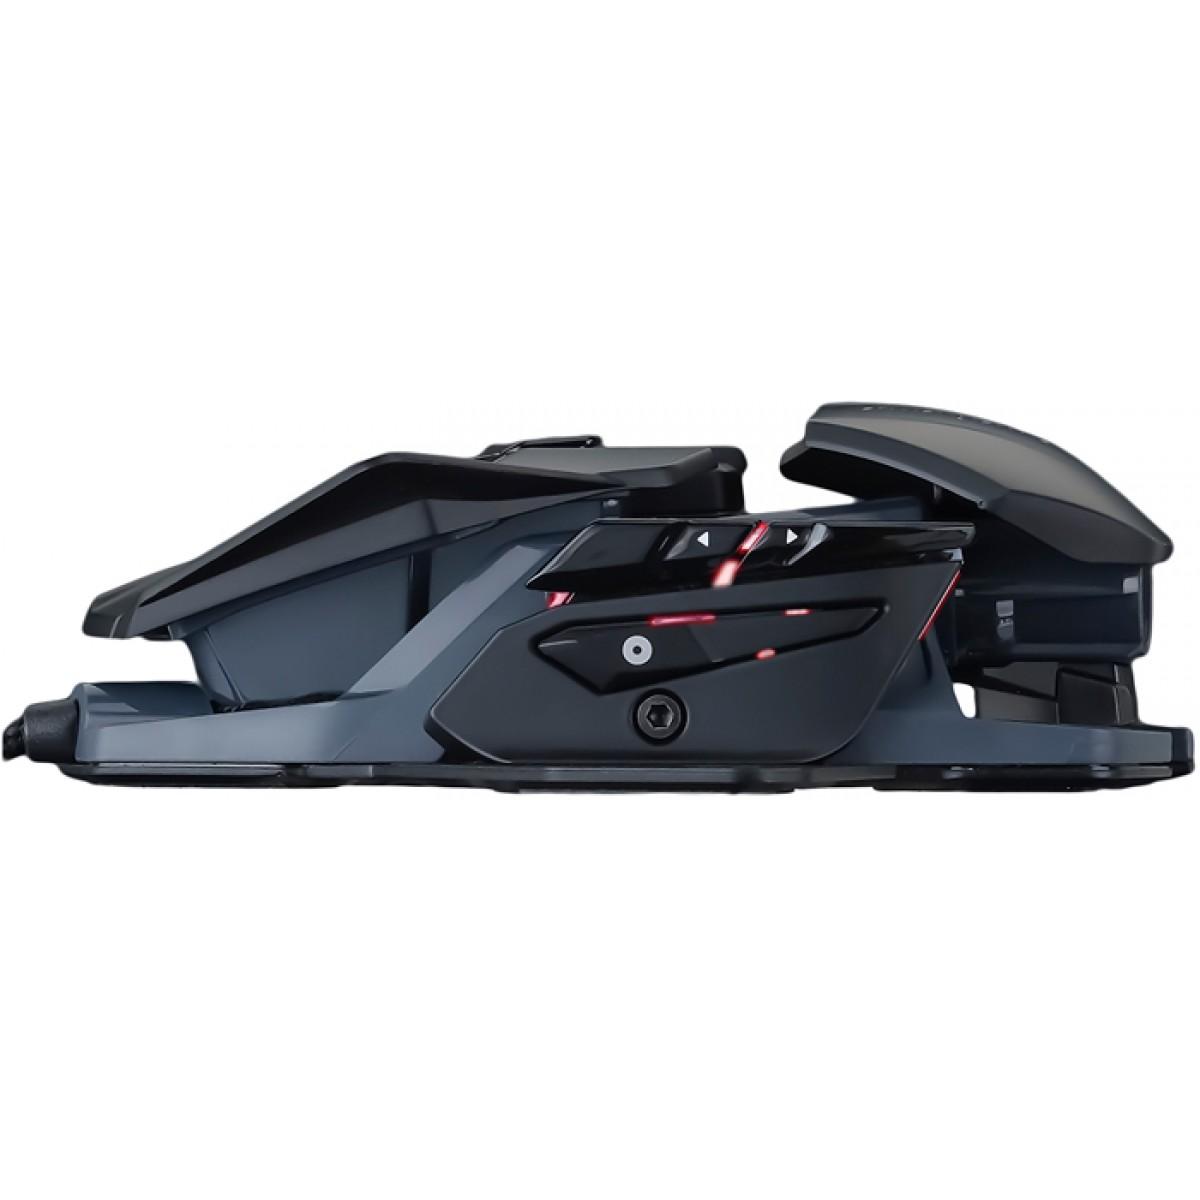 Mouse Gamer Mad Catz RAT Pro S3, 7200 DPI, 8 Botões, Black, MR03DCAMBL00